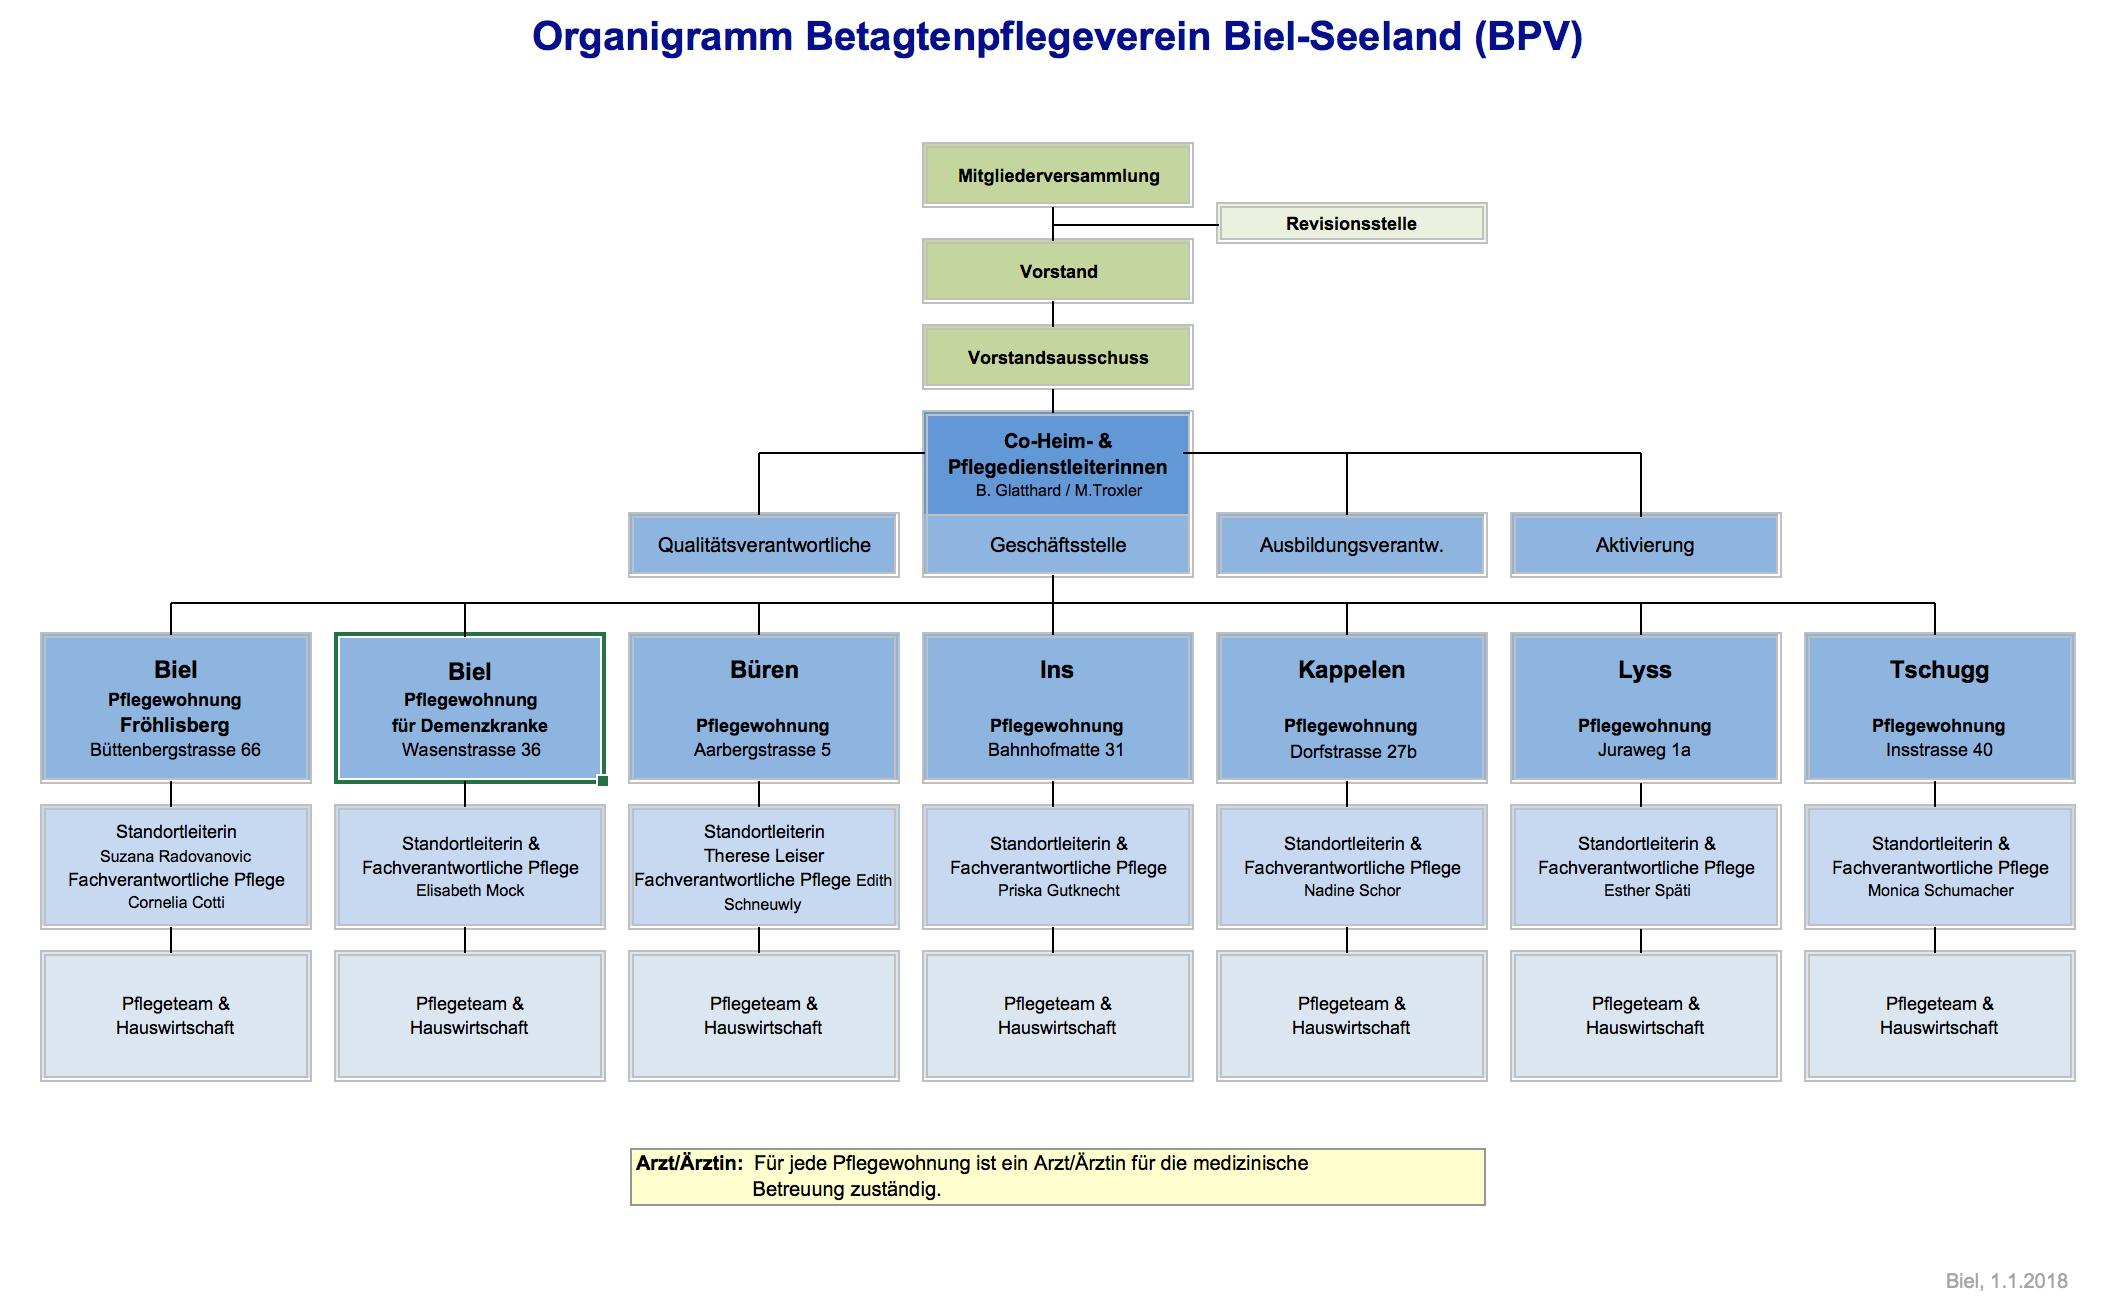 Organigramm BPV